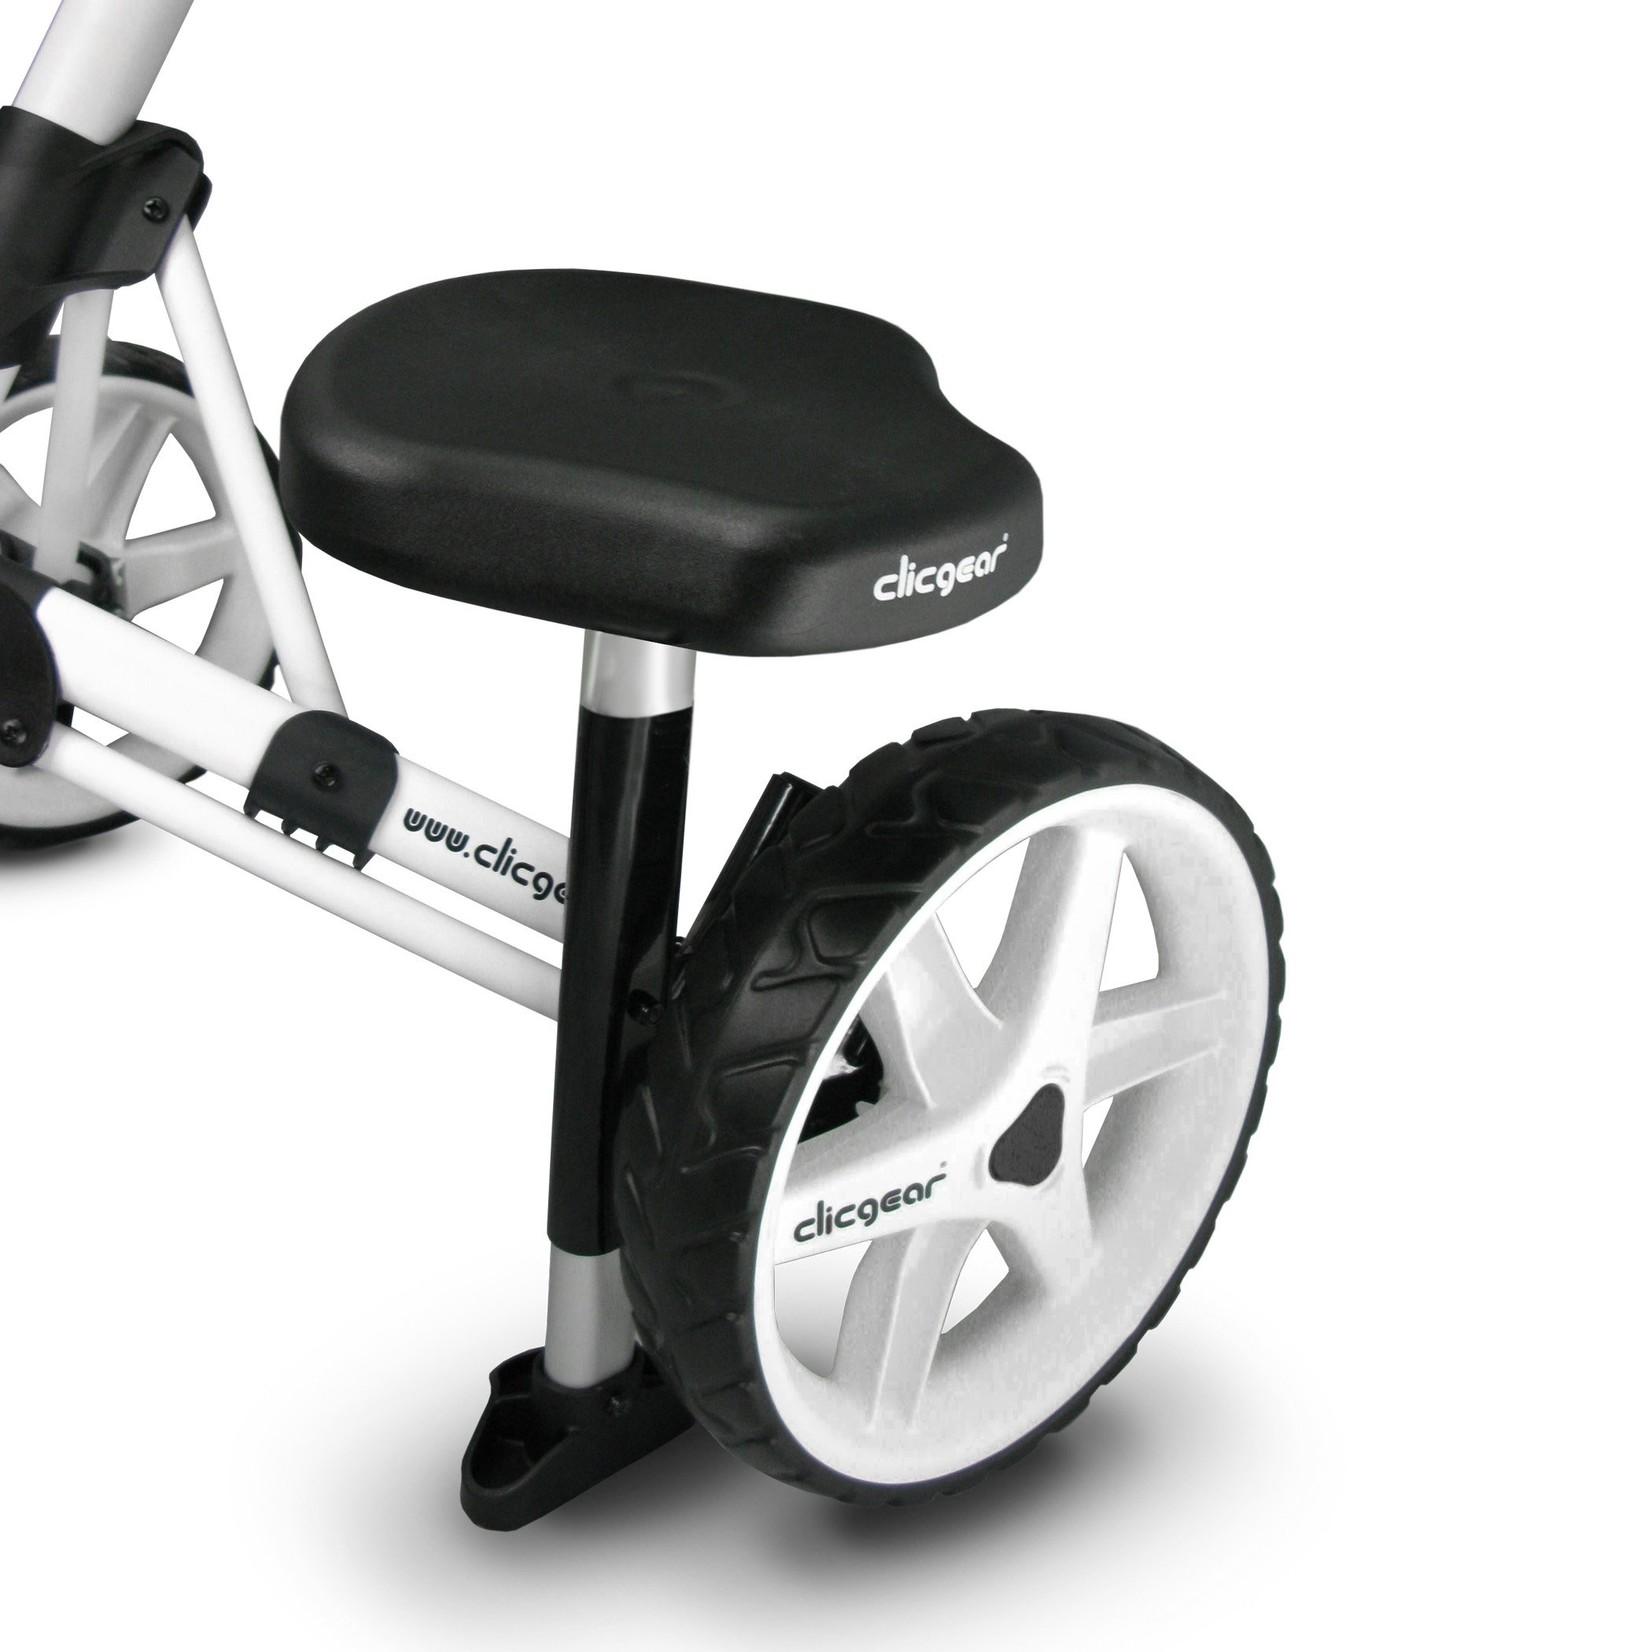 Clicgear Clicgear 3 Wheel Cart Seat CGCS01